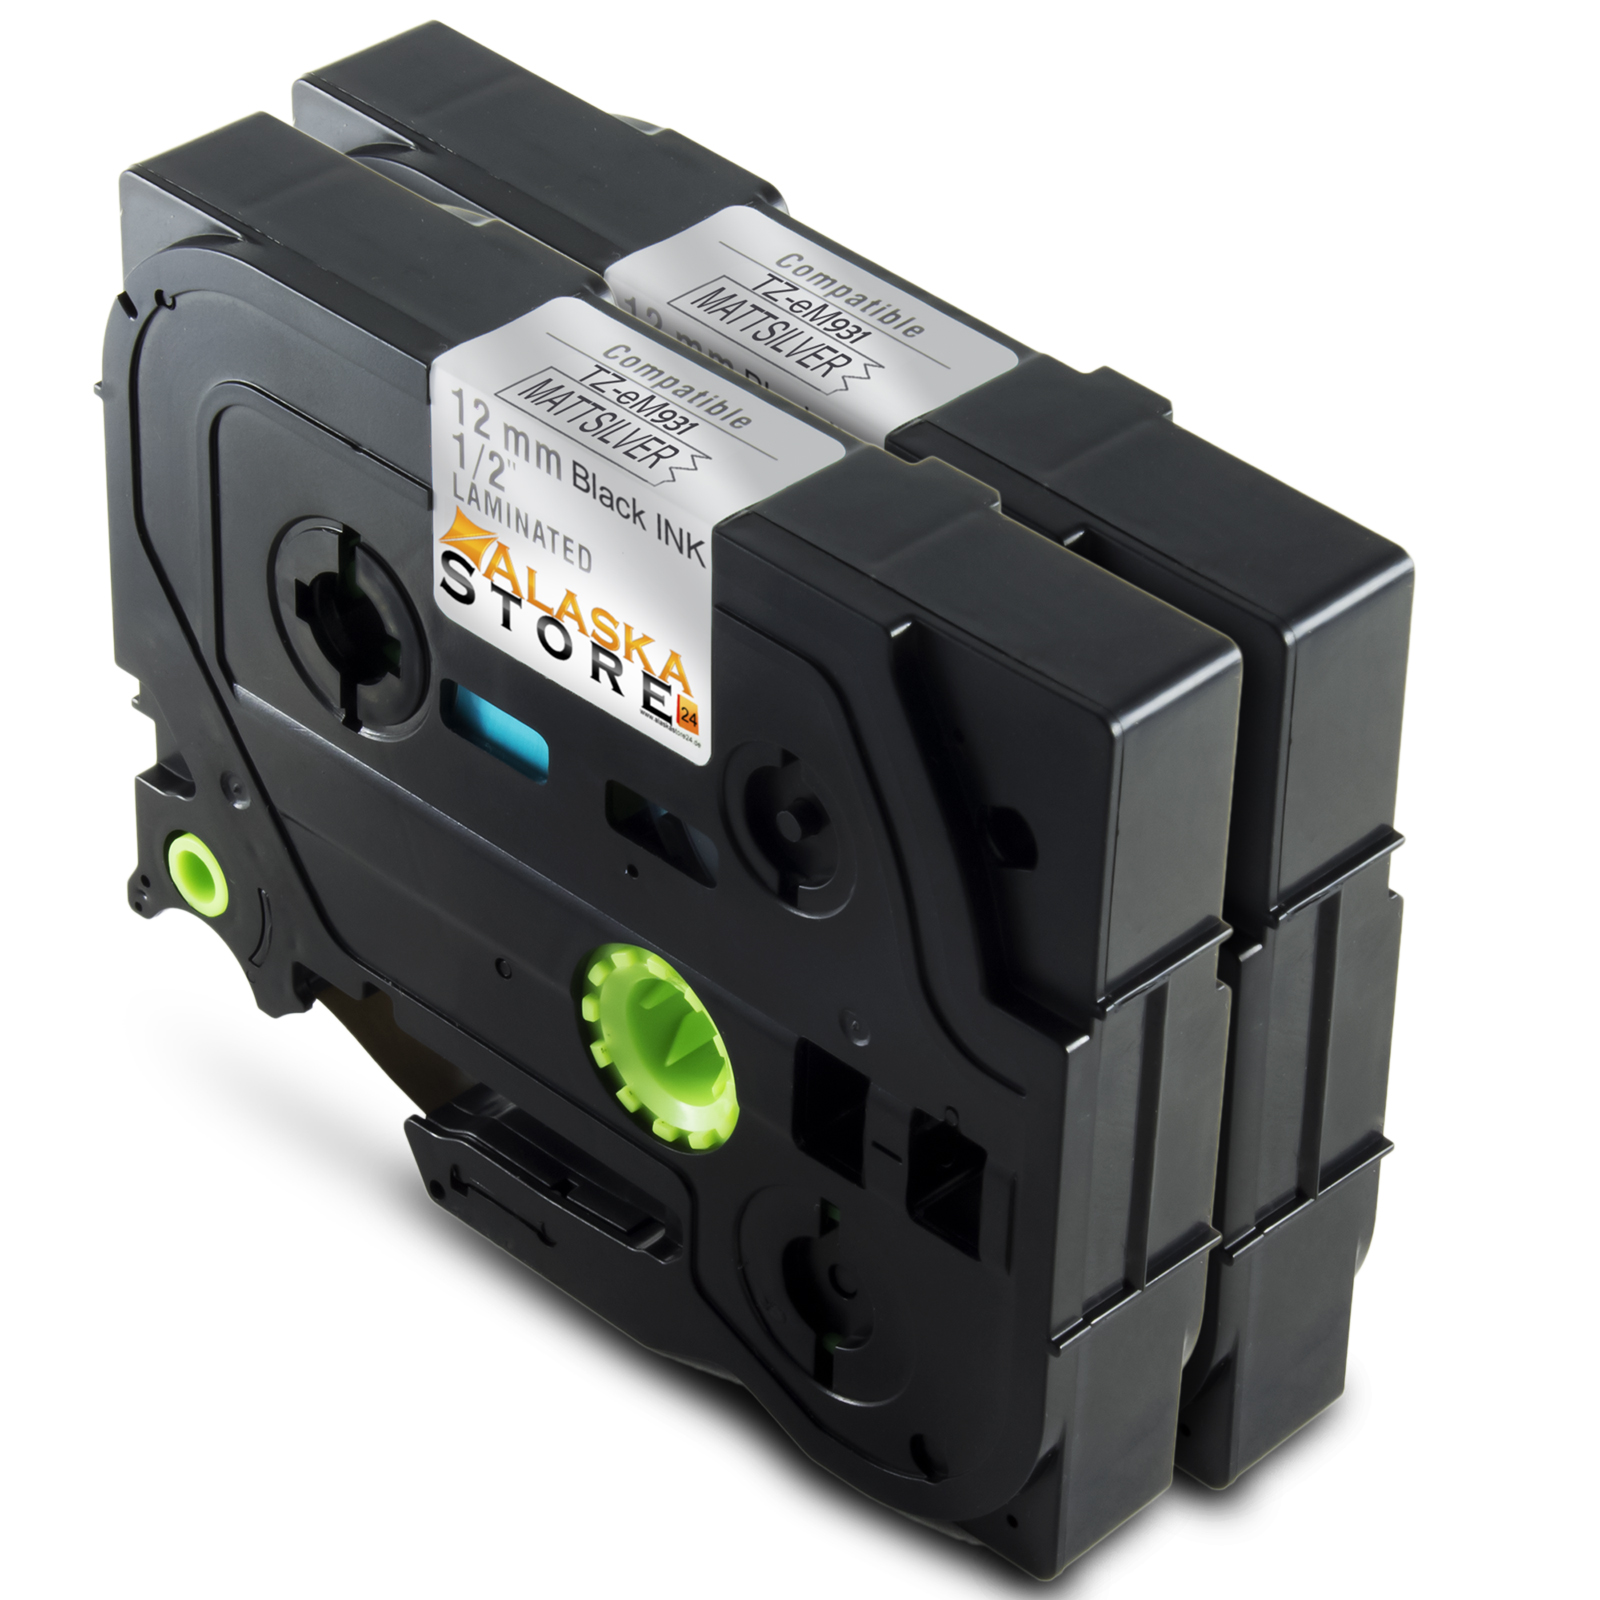 2x-Schreibband-for-Brother-TZ-931-1A-Produkt-P-Touch-1250s-2500PC-1280DT-H300LI